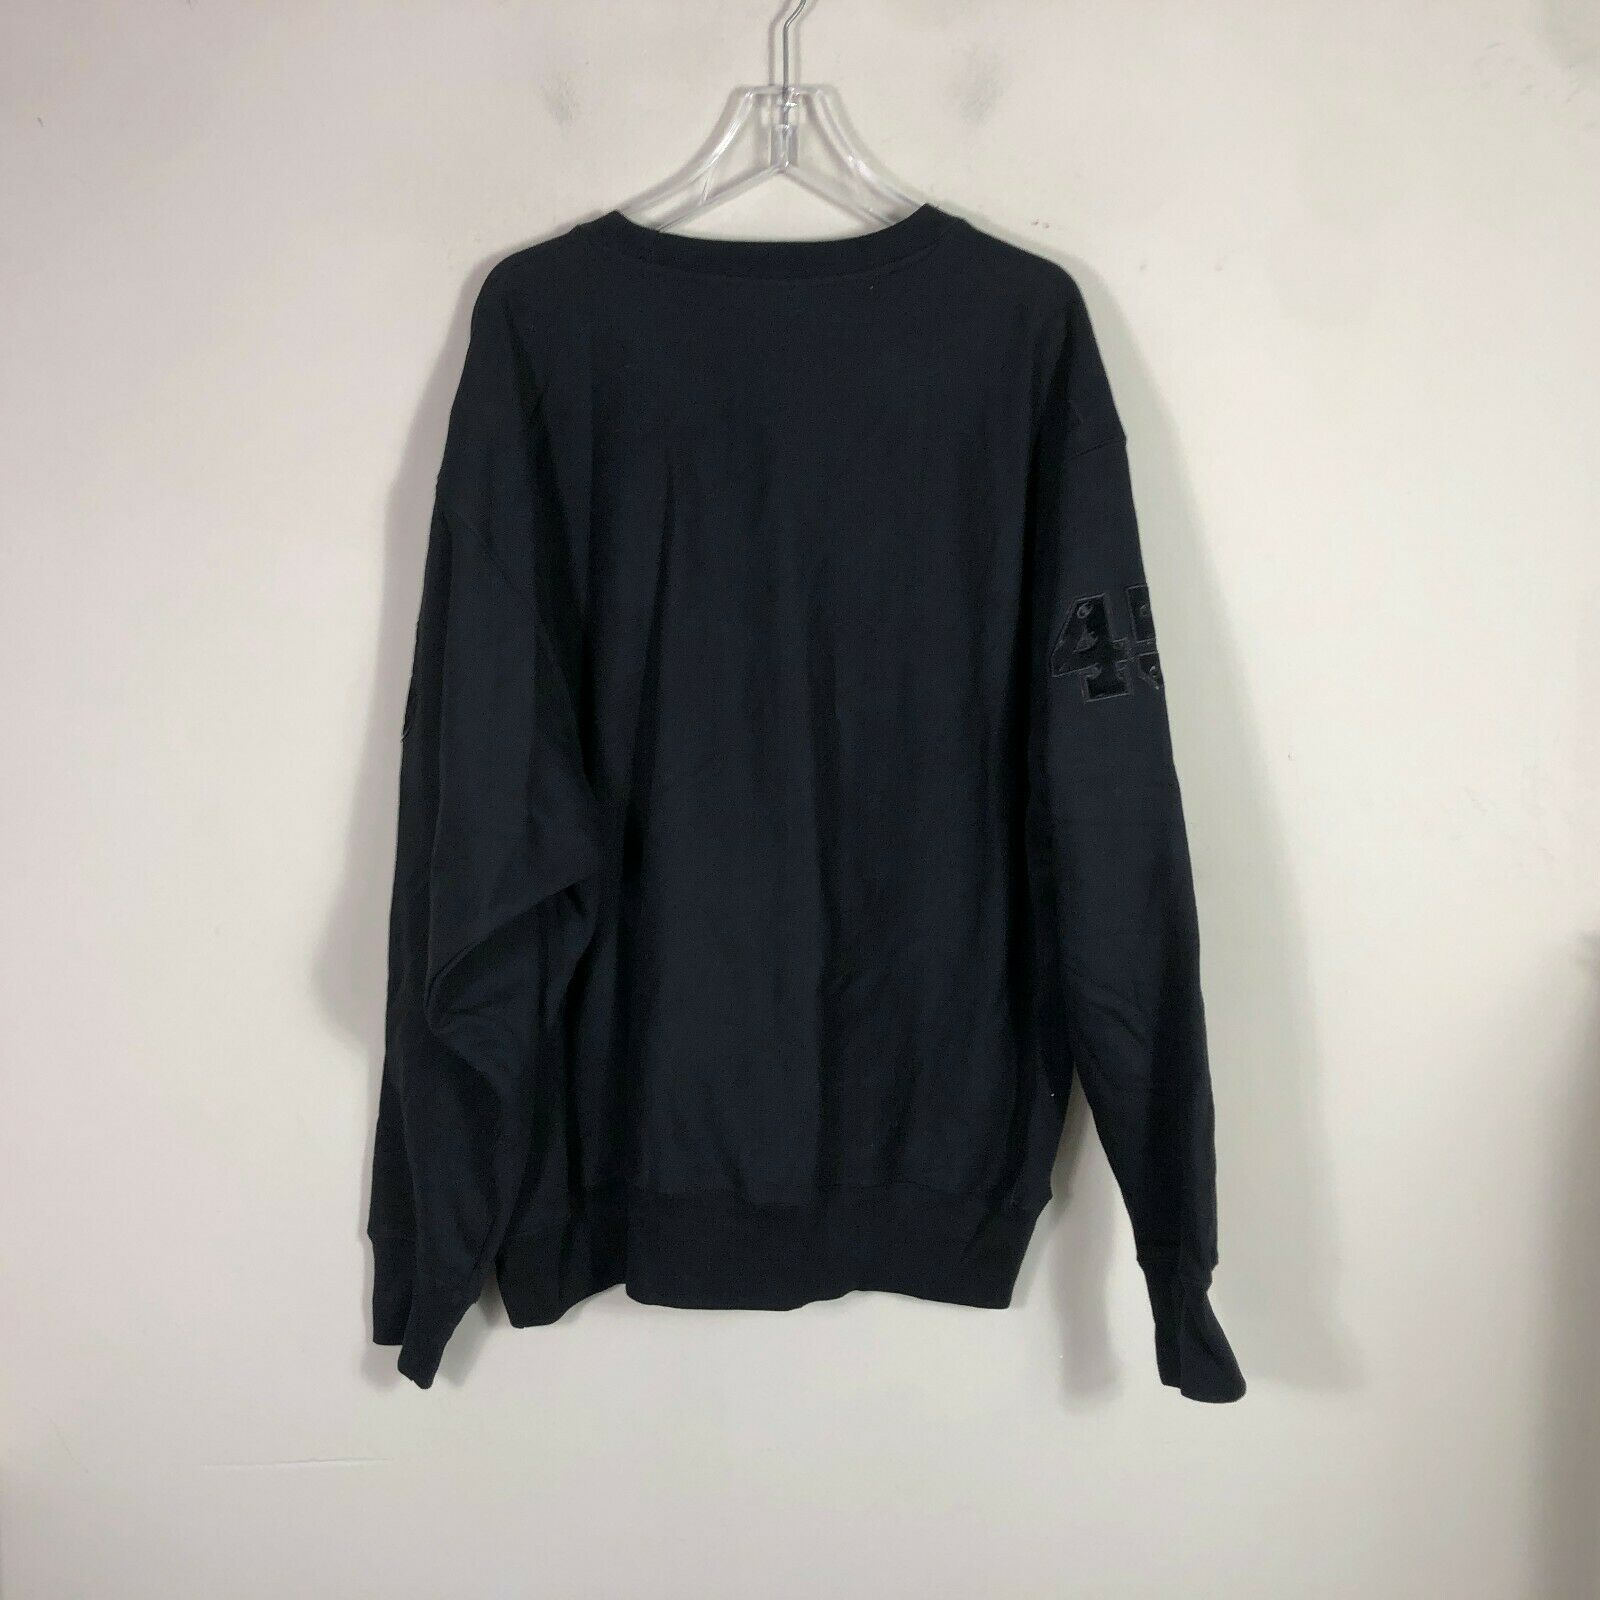 Vintage Champion Crew Neck Reverse Weave Sweatshirt XL NBA NBPA Sweatshirt image 2